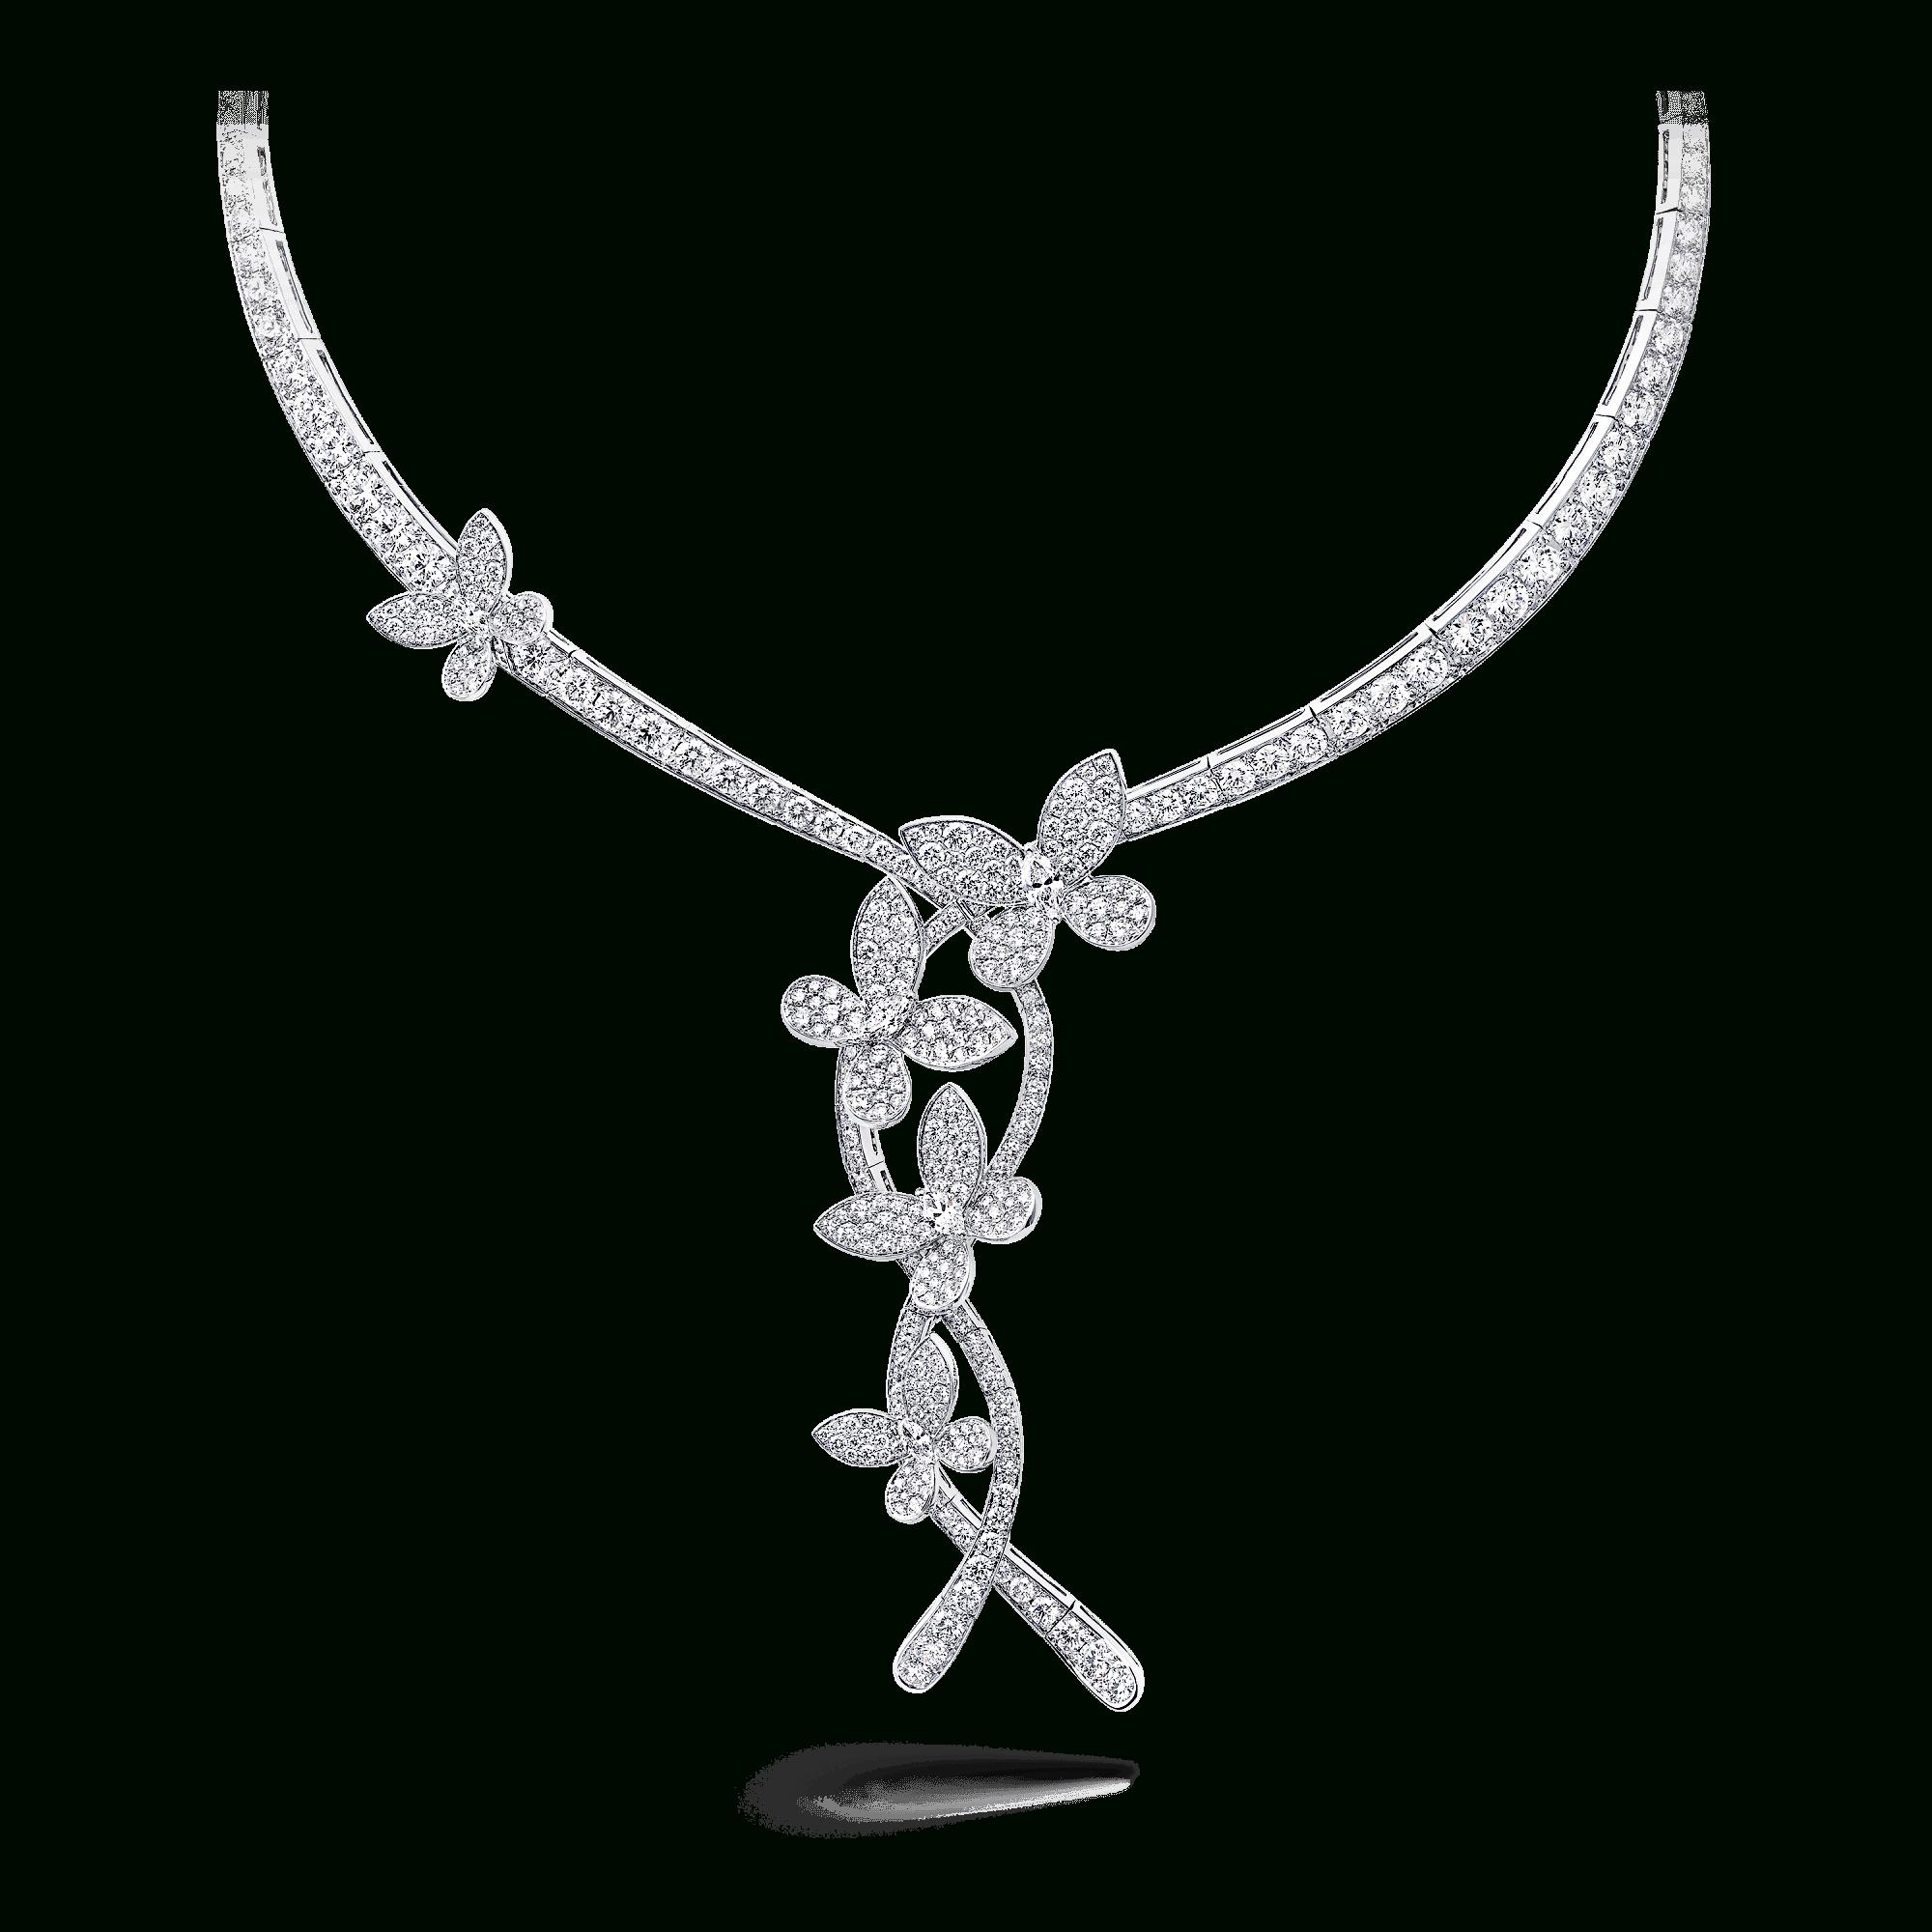 Triple Pavé Butterfly Necklace, Diamond | Graff Pertaining To 2019 Blue Pavé Butterfly Brooch Necklaces (View 20 of 25)